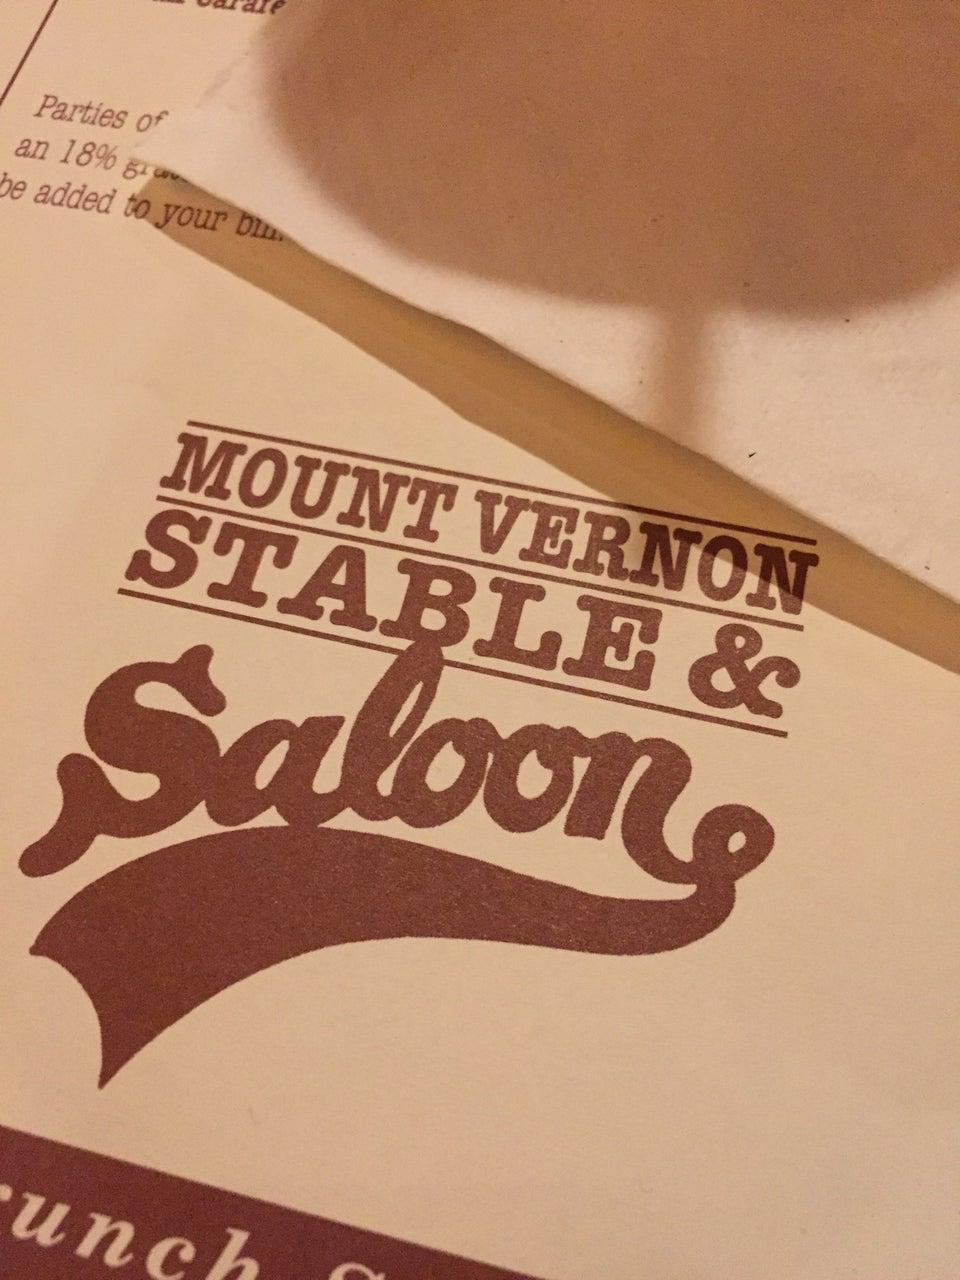 Photo of Mount Vernon Stable & Saloon